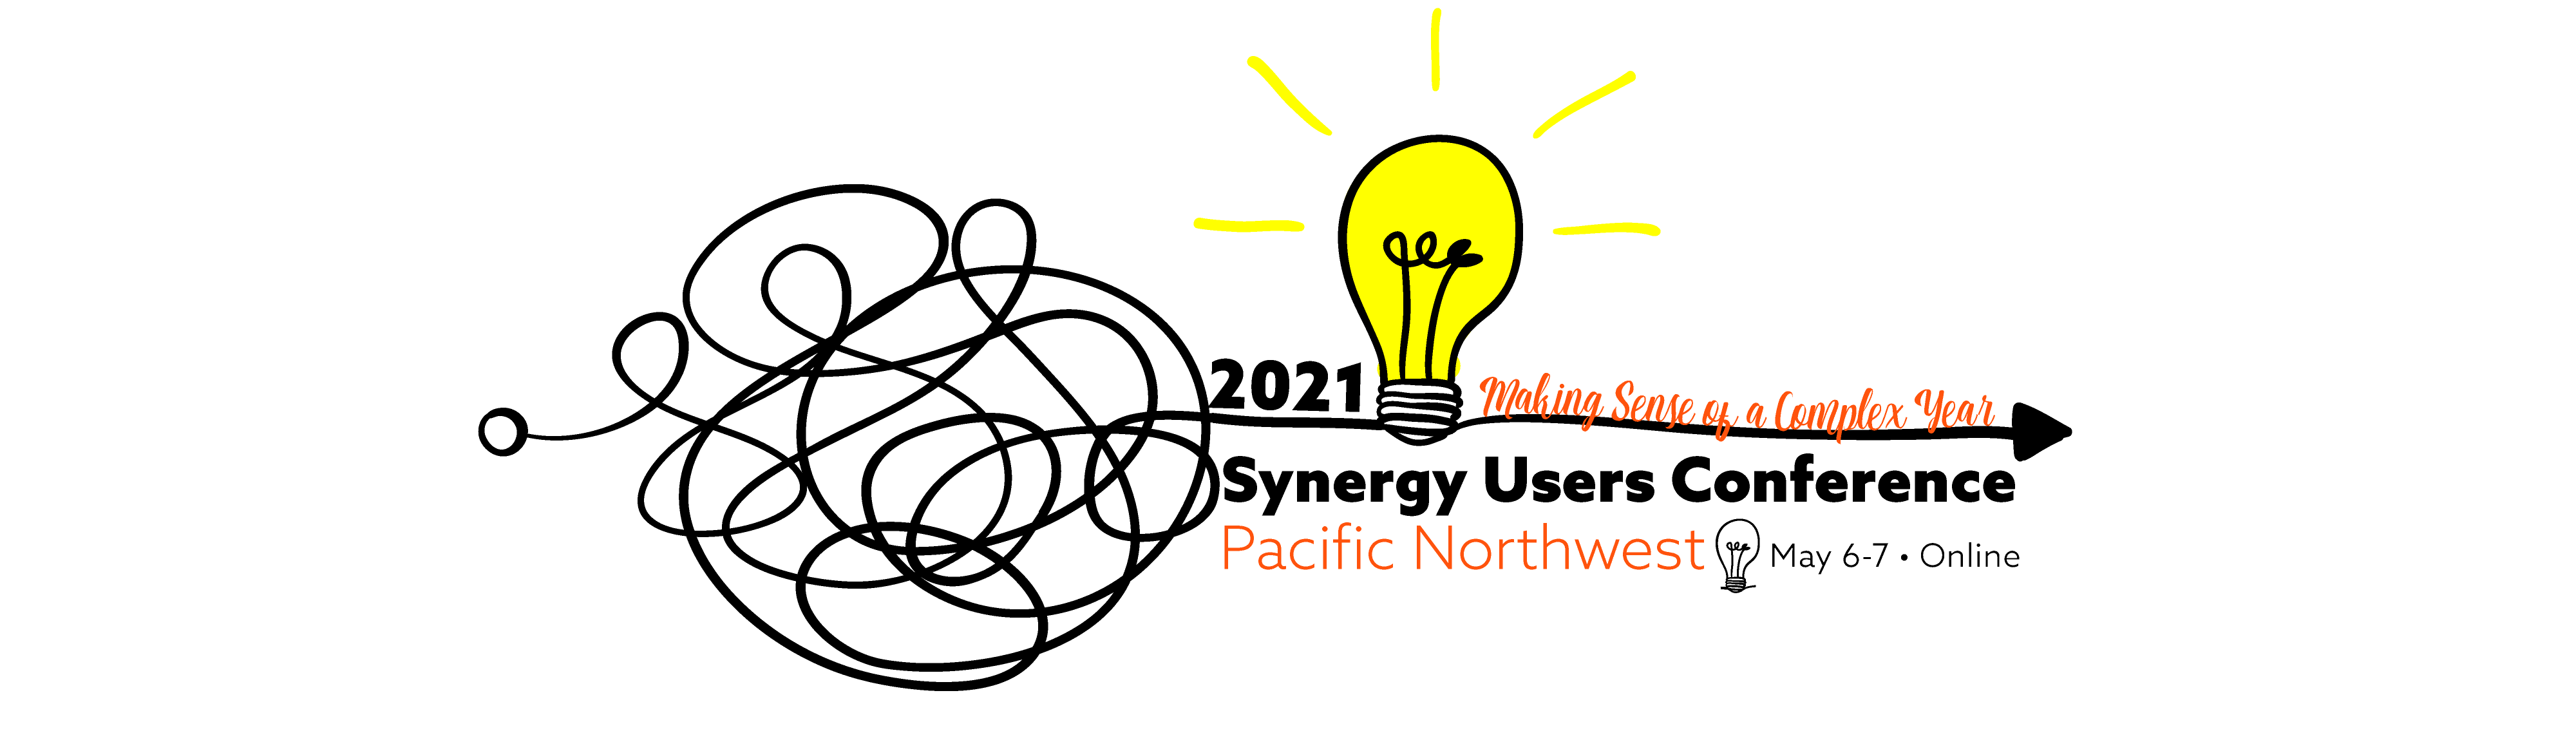 Synergy PNW 2021 logo